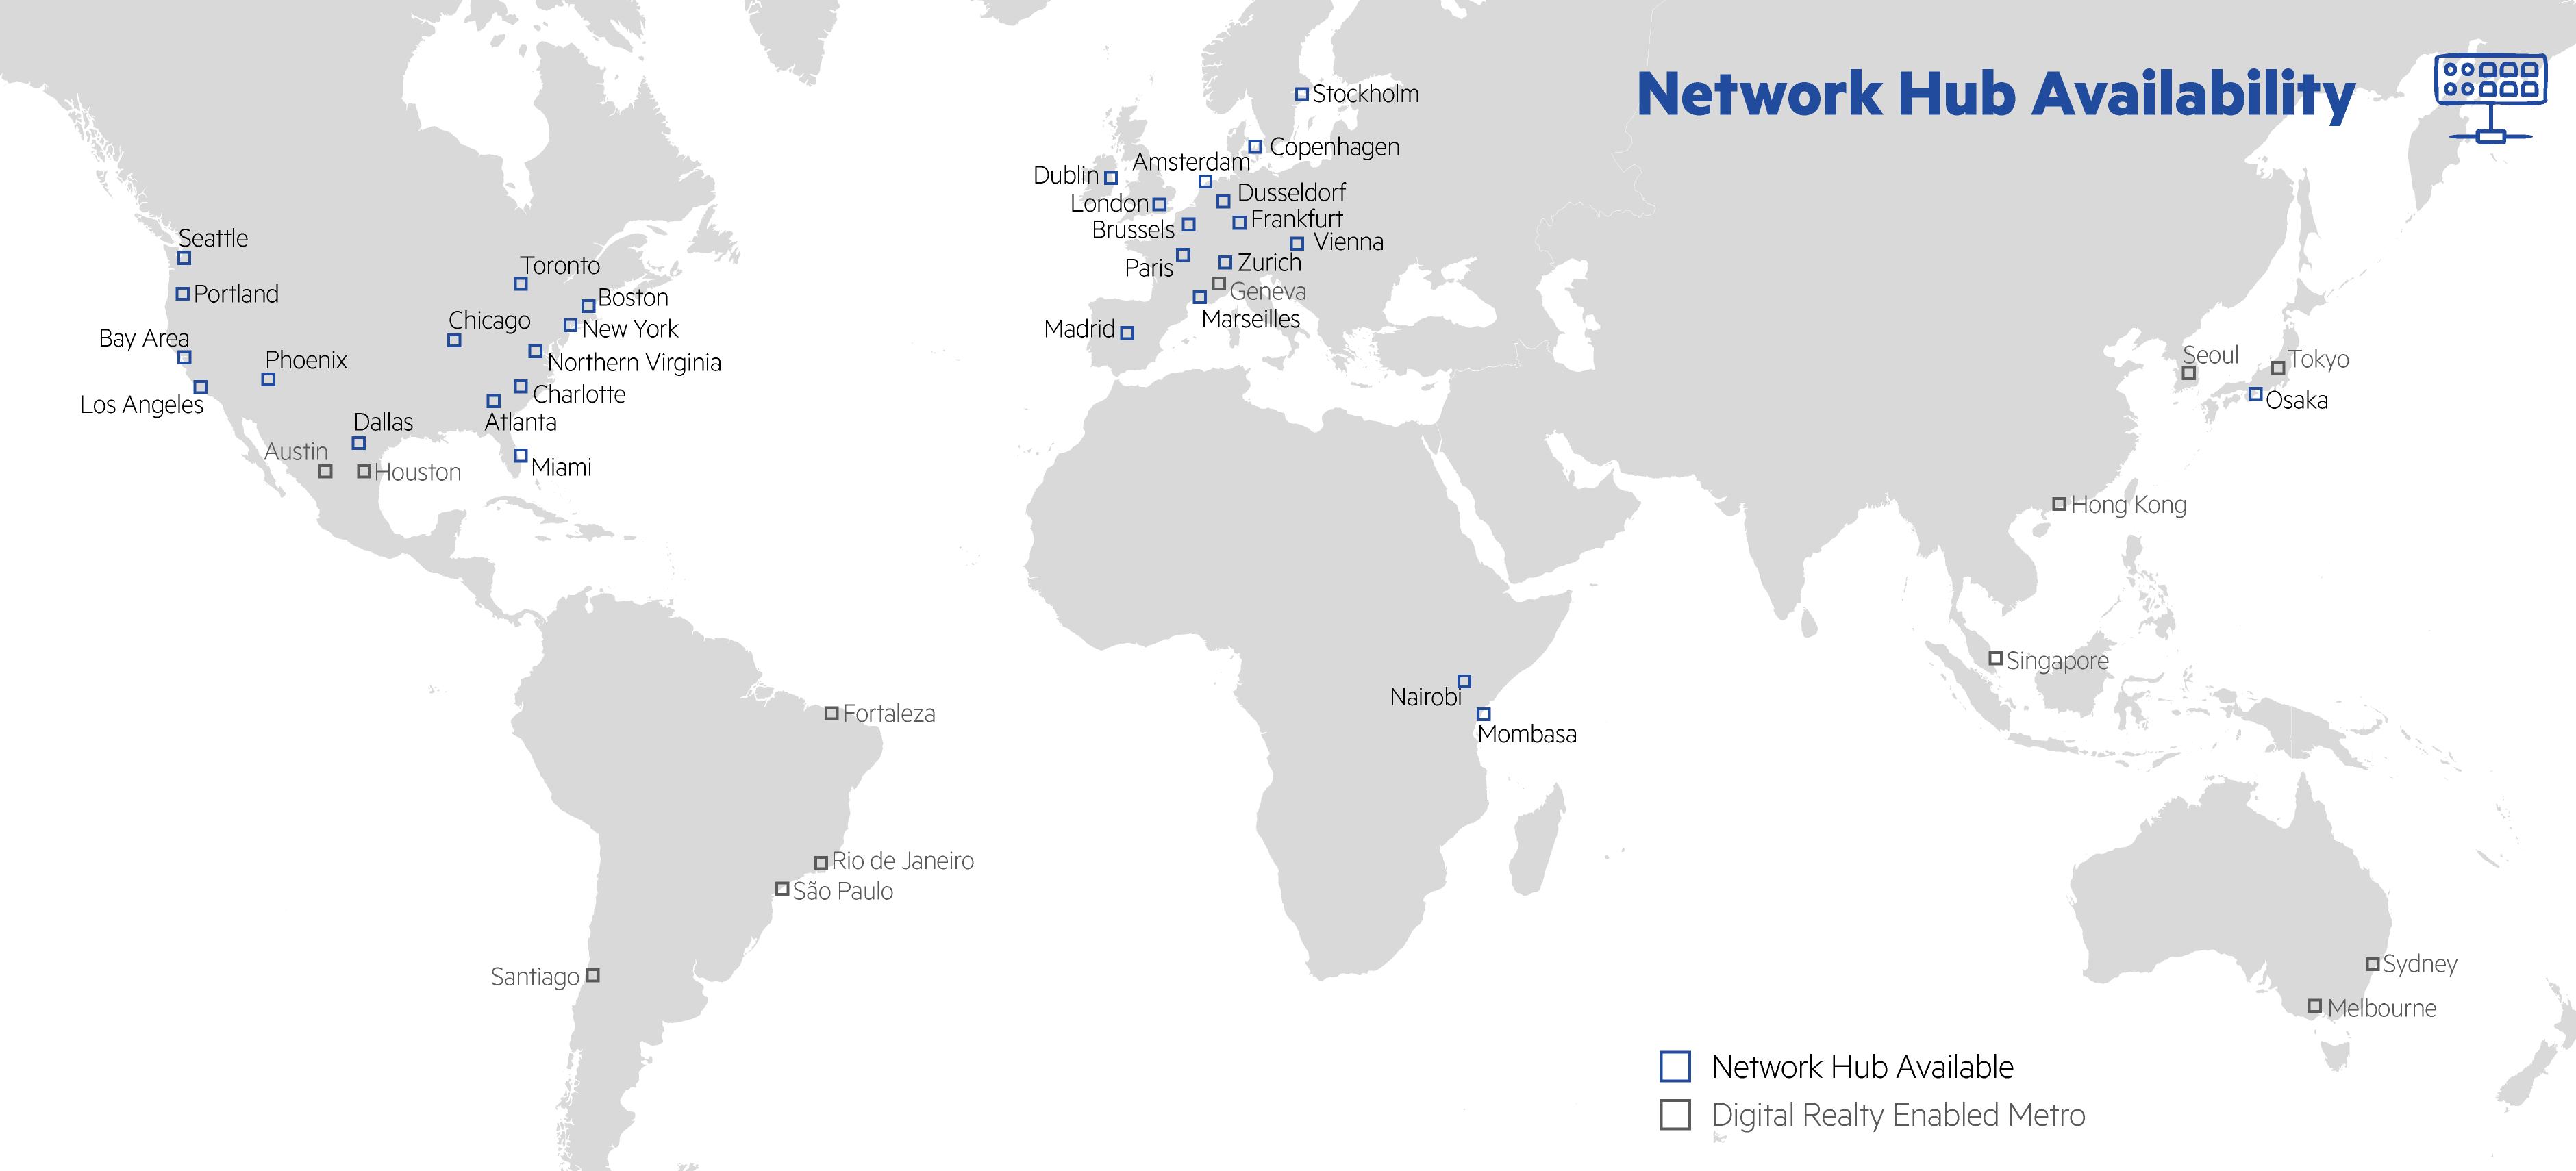 Network Hub Map